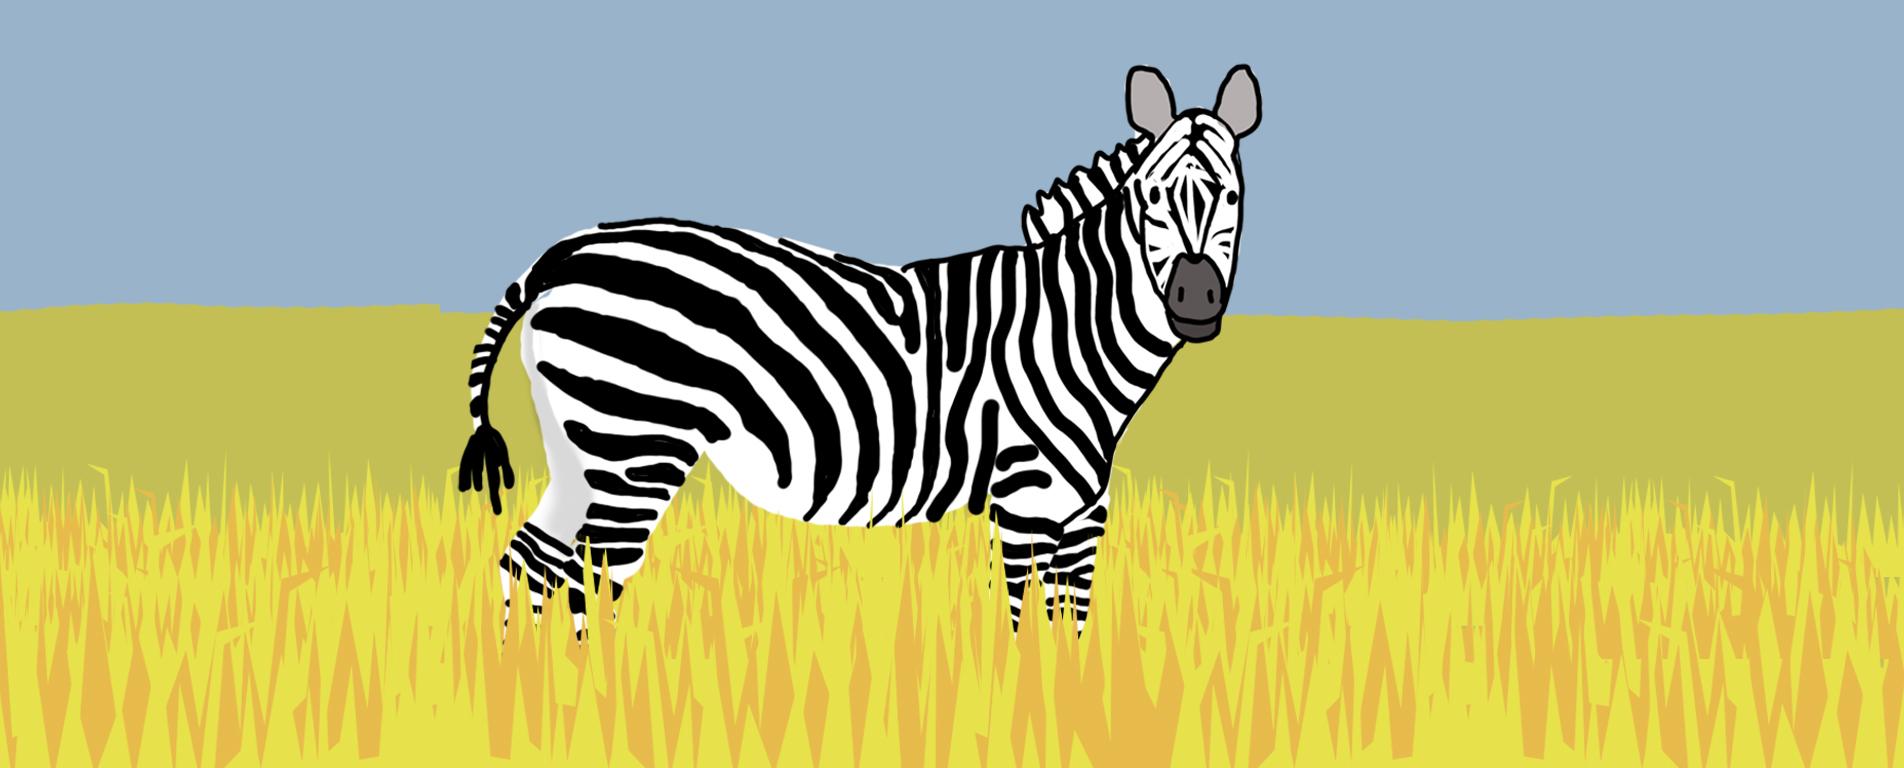 Zebra by Jane Aaron